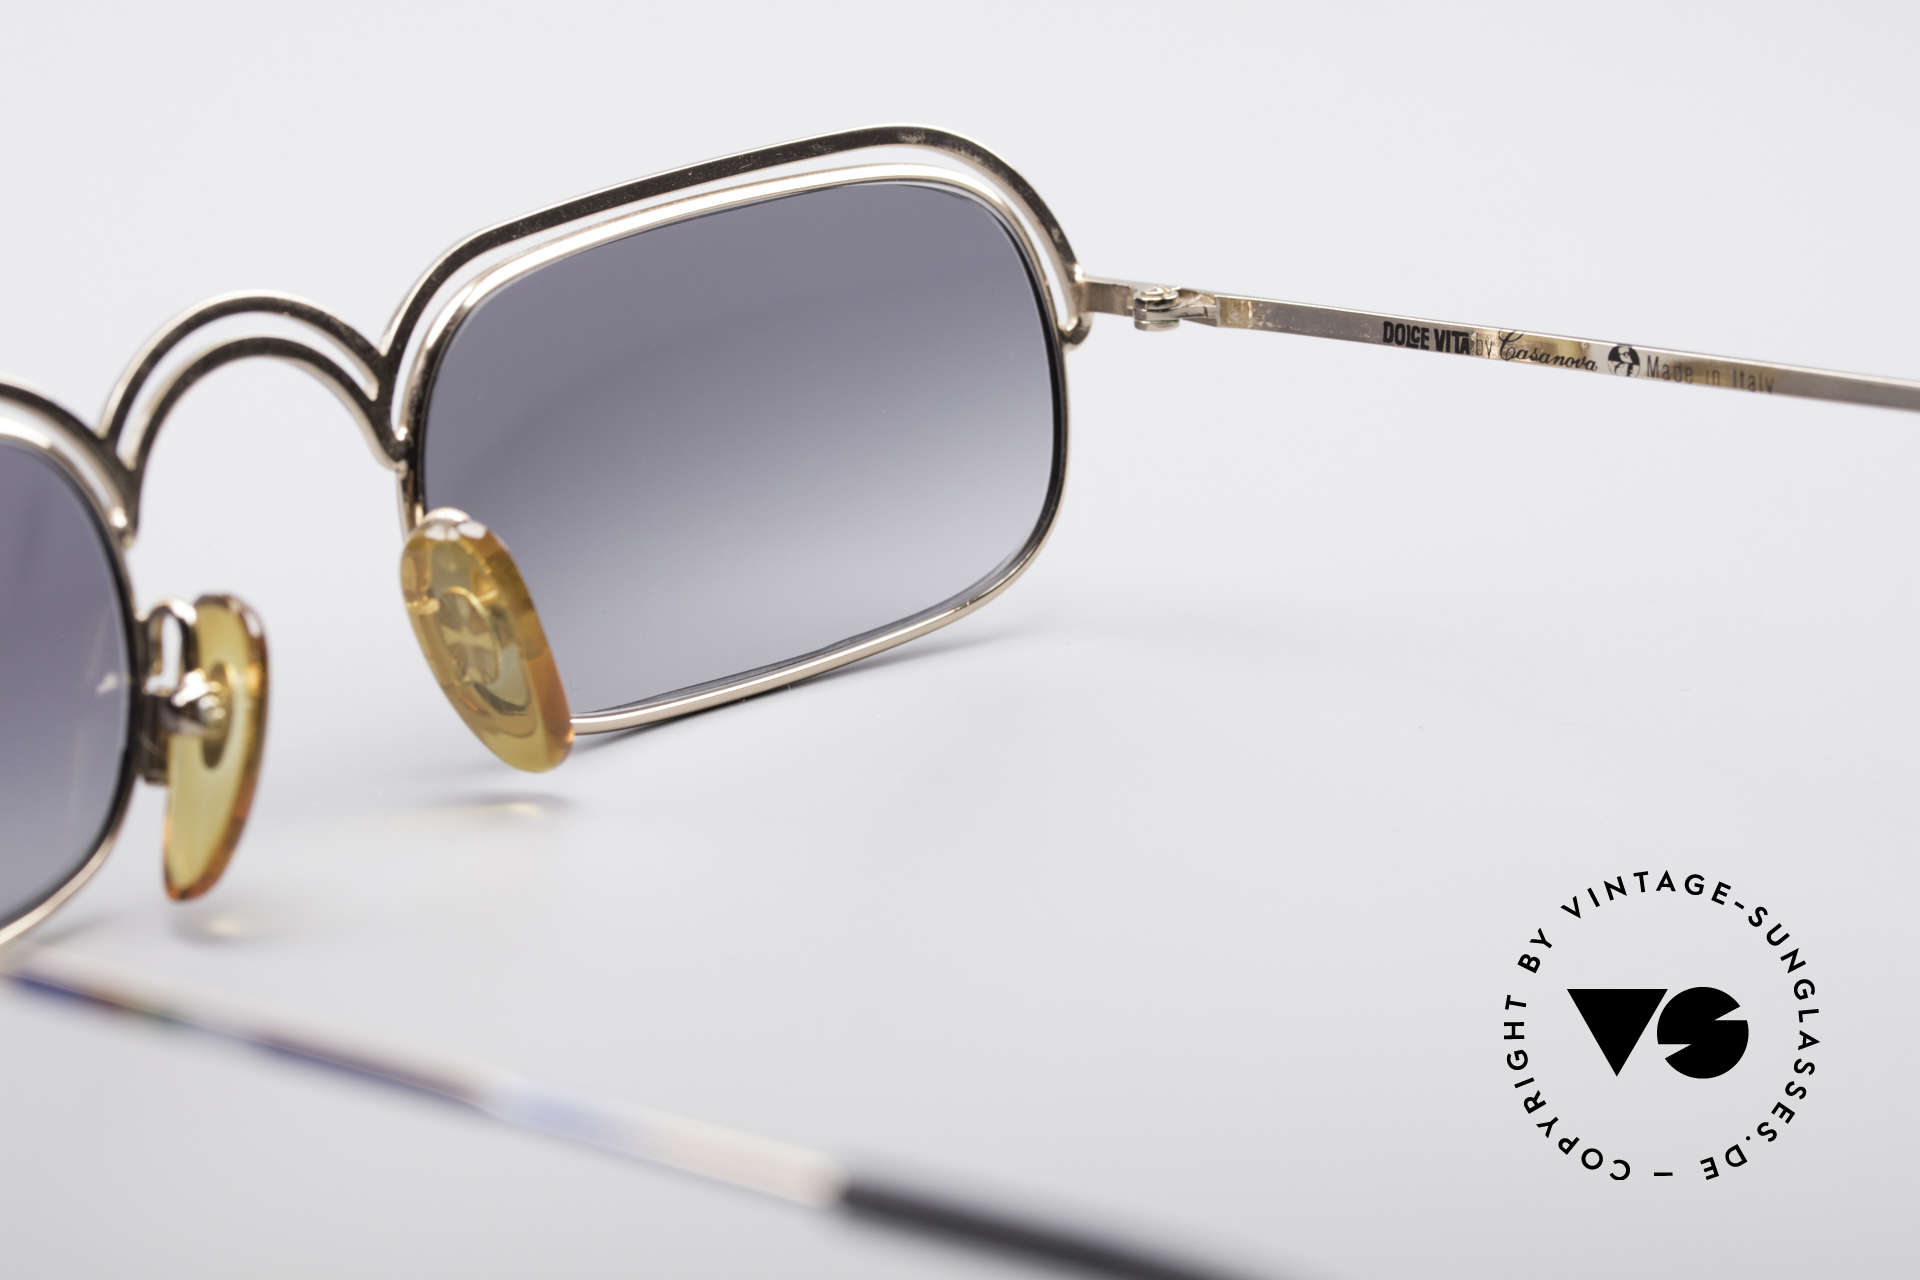 Casanova DV14 Dolce Vita Sunglasses, NOS - unworn (like all our artistic vintage sunglasses), Made for Men and Women